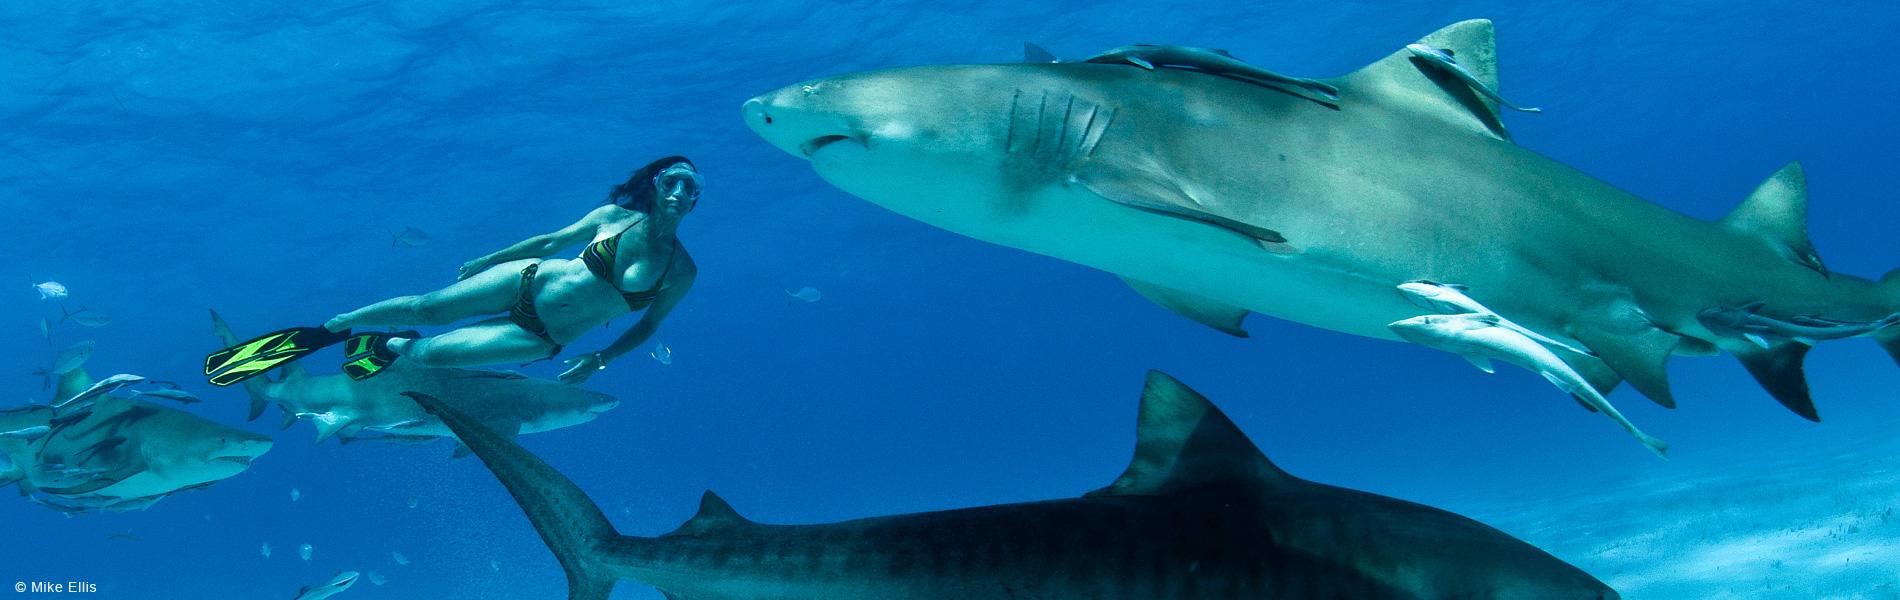 Lesley Rochat Shark Activist